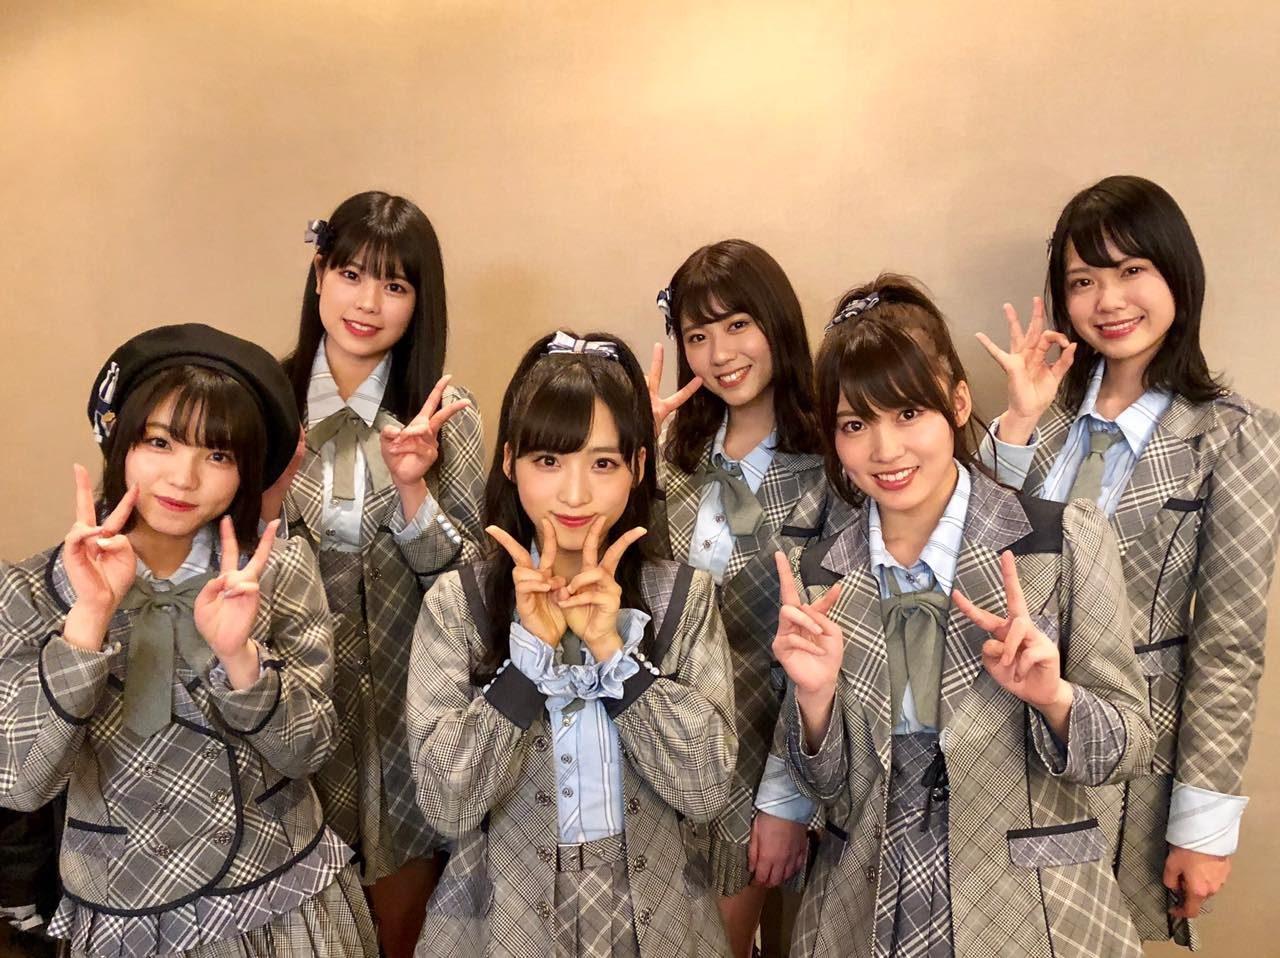 "AKB48 チーム8 RIF選抜 * テレ朝「サイキ道」""出張!六本木アイドルフェスティバル in 渋谷""に潜入! [3/17 26:55~]"